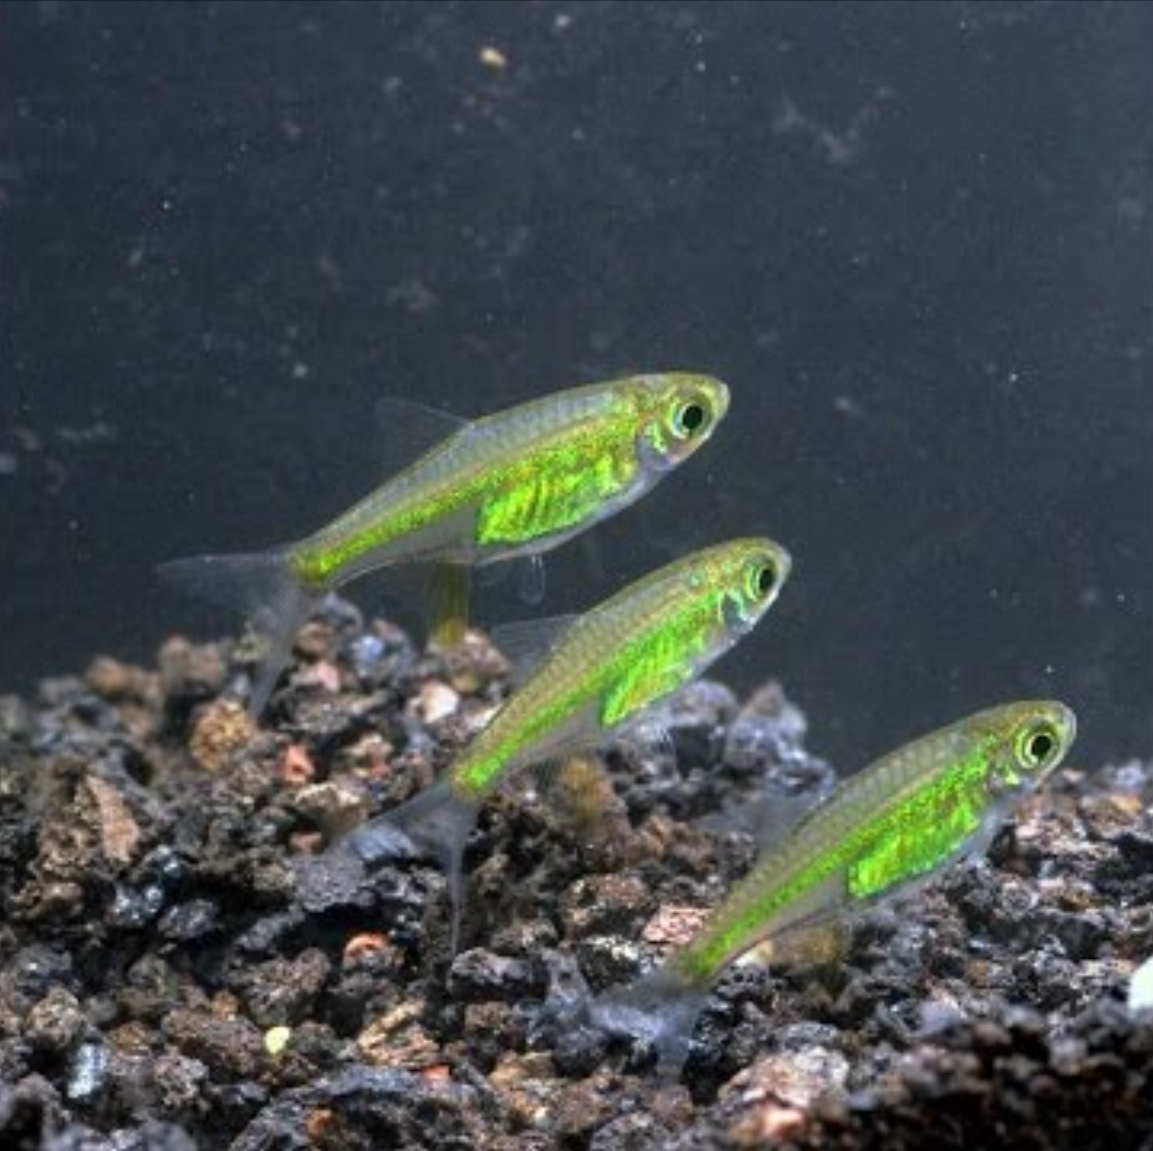 neon green rasbora (quite rare to see green fish) - meme